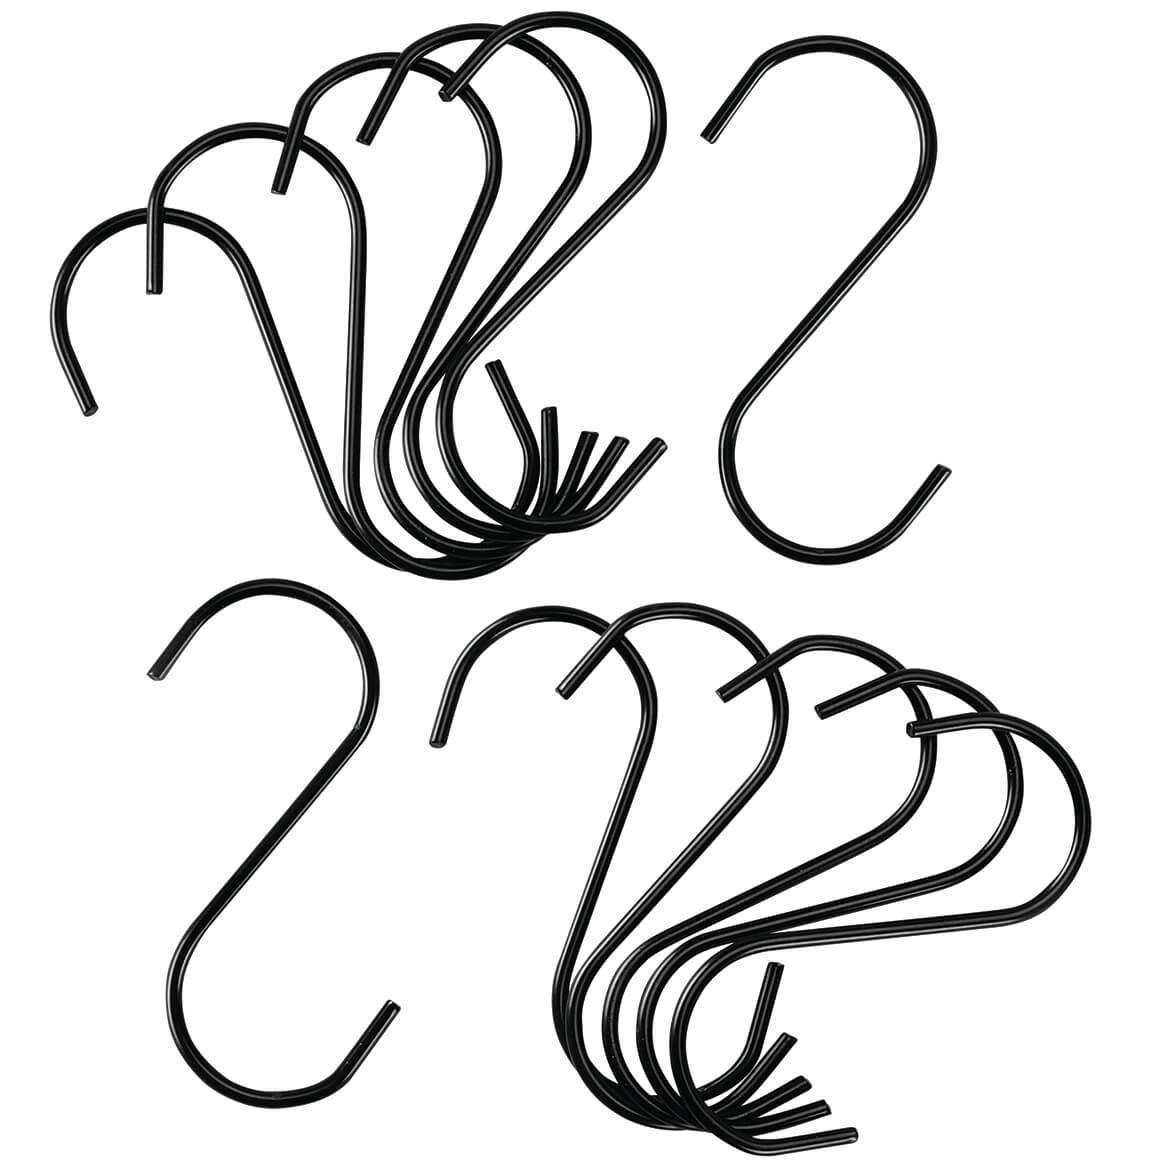 S-Hooks Set of 12-369652